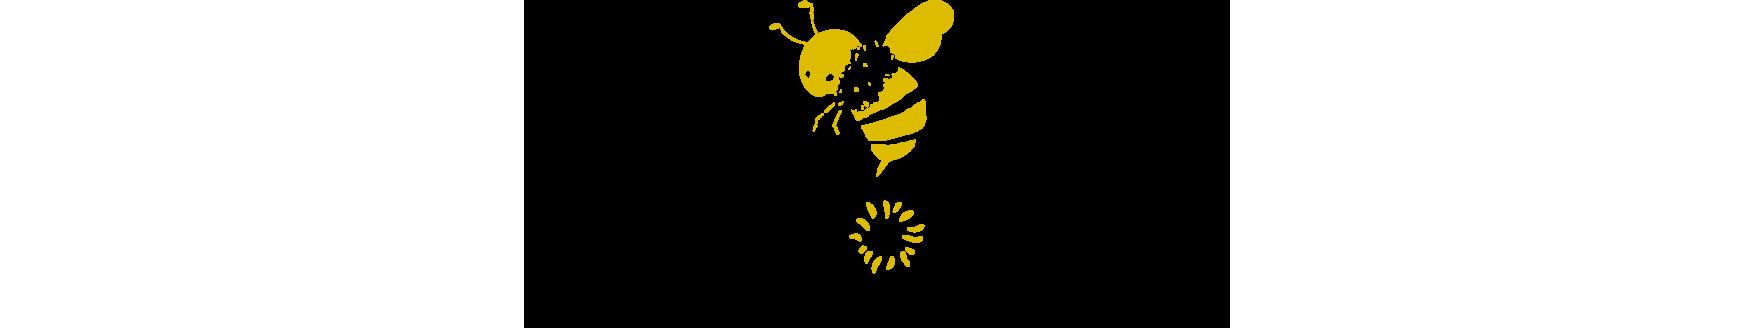 Bee polette